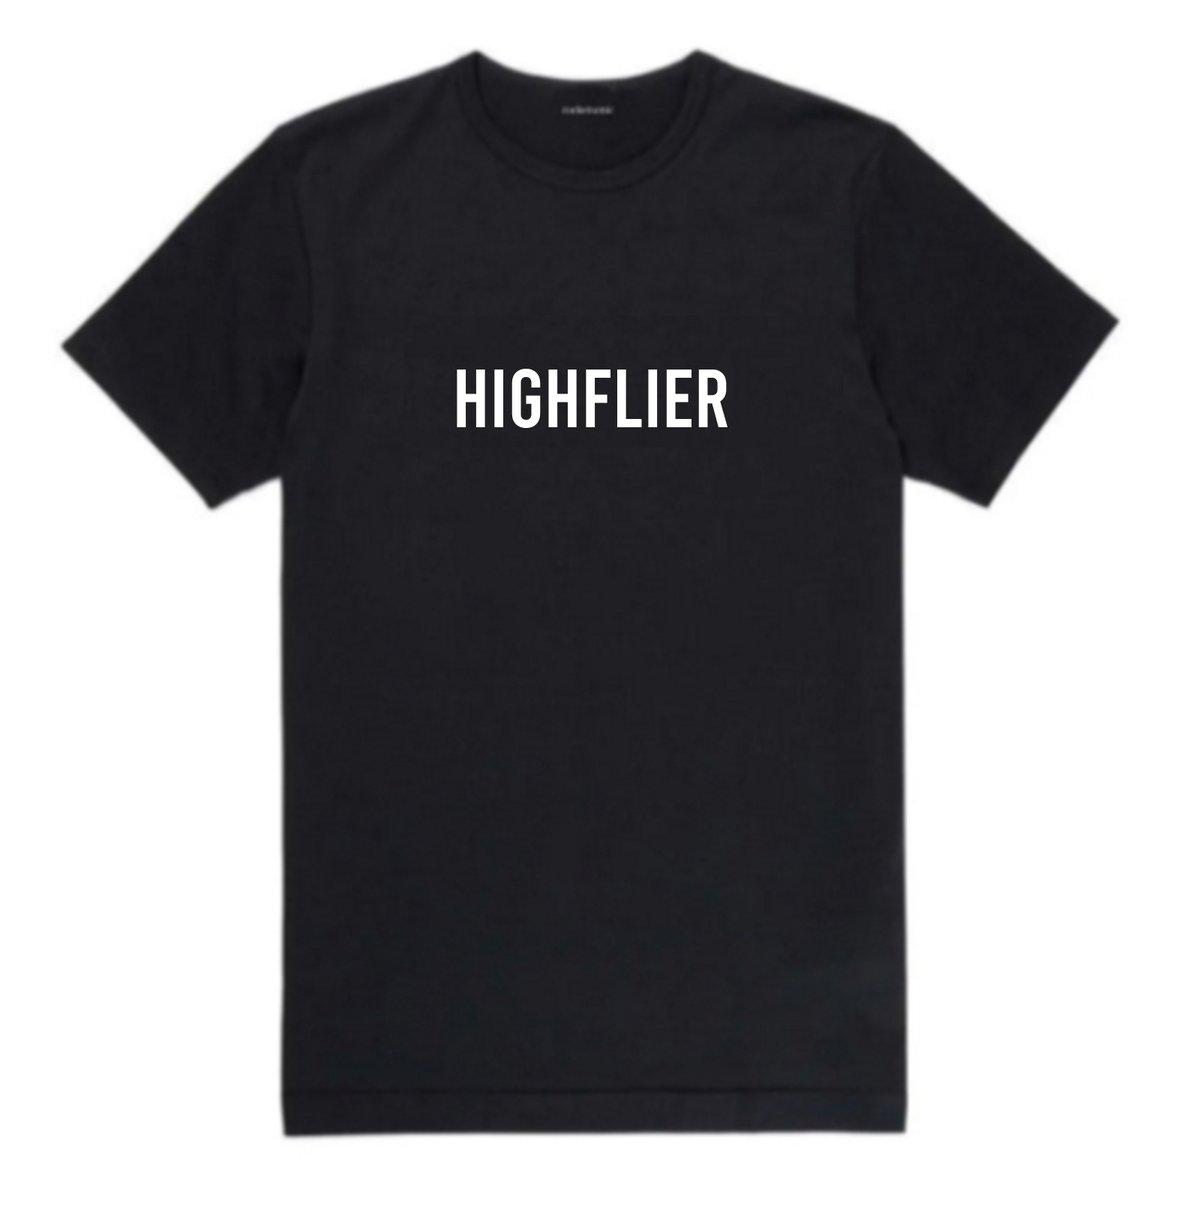 Image of 'Highflier' Slogan Black Tee